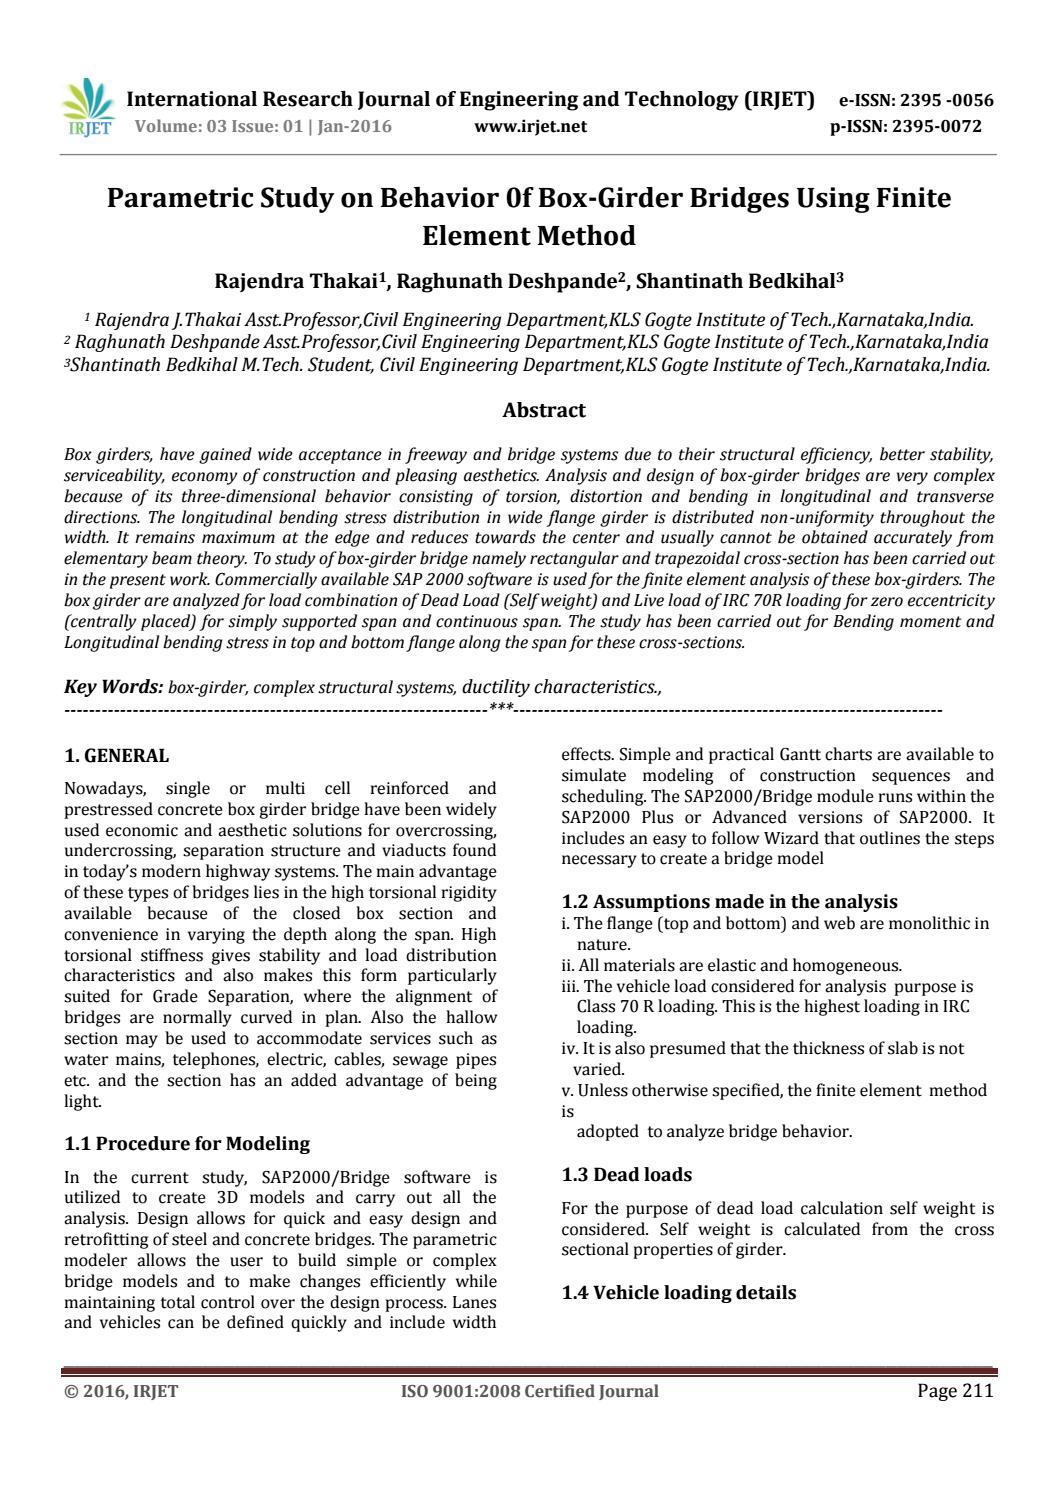 Parametric Study on Behavior 0f Box-Girder Bridges Using